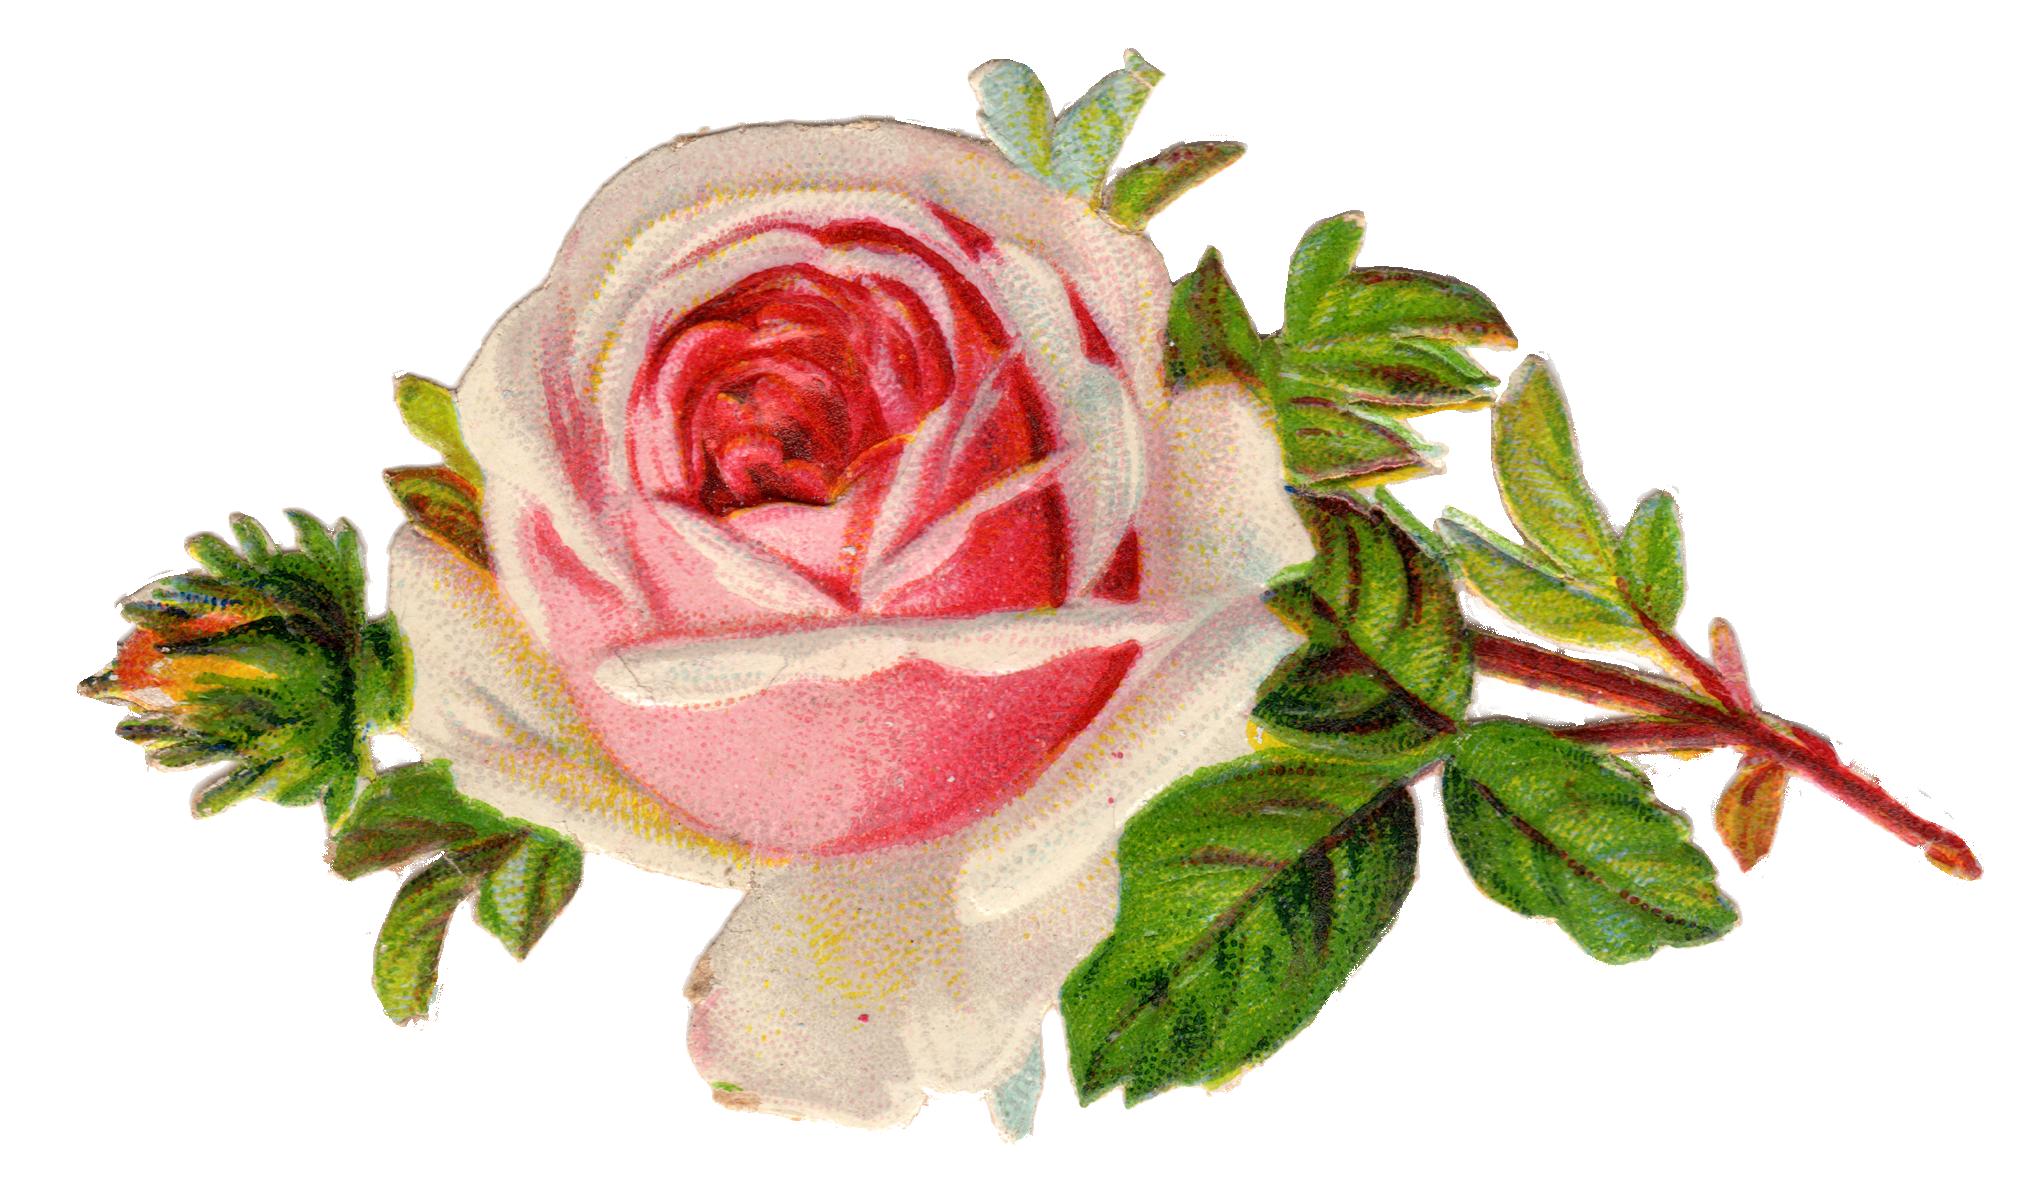 Rose pink baby cross clipart free Free Vintage Rose Clip Art | Pinterest | Clip art, Ephemera and Vintage free